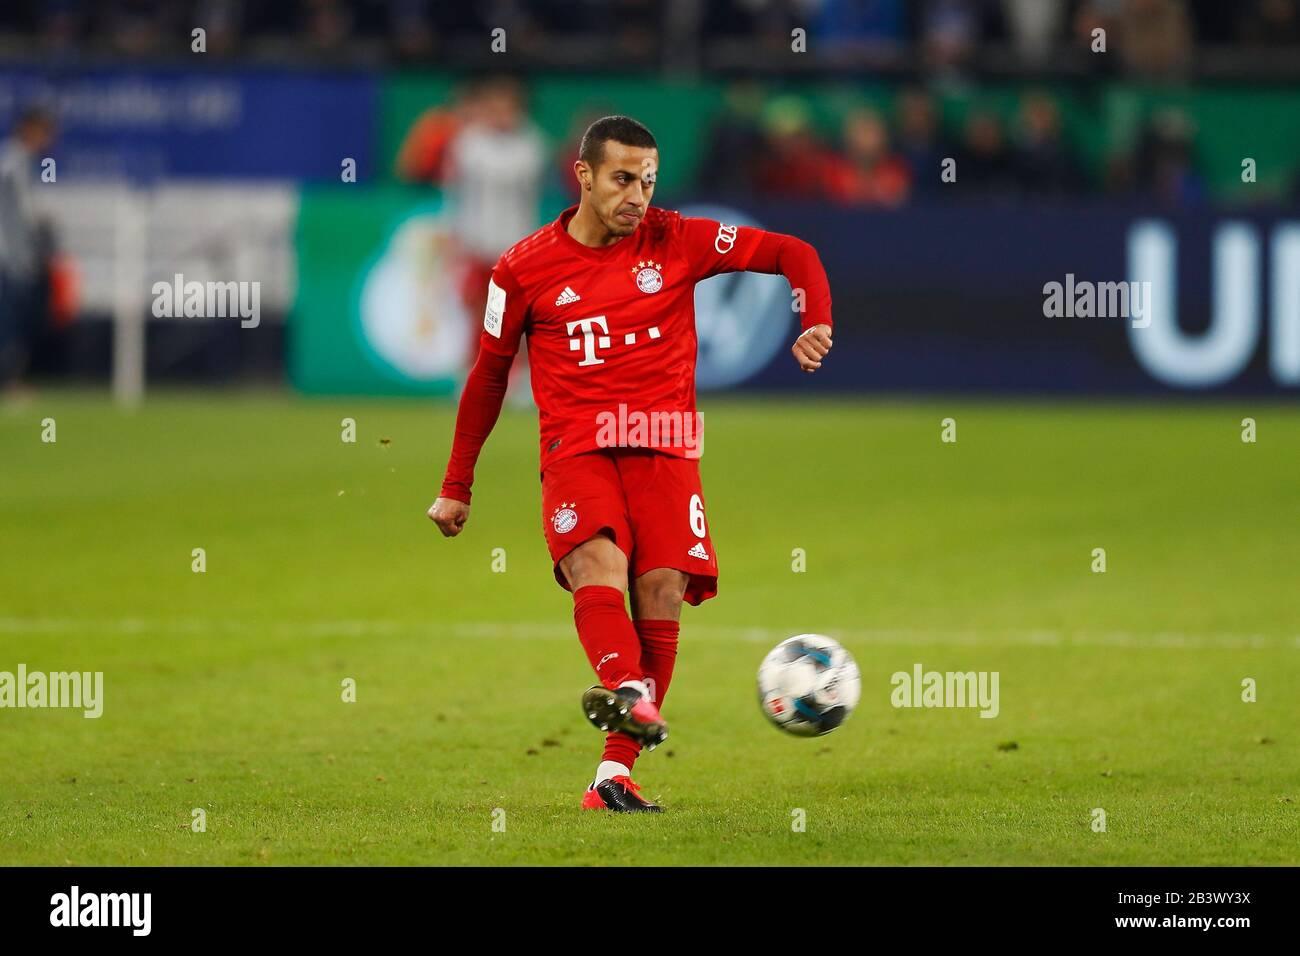 Gelsenkirchen Germany 3rd Mar 2020 Thiago Alcantara Bayern Football Soccer Germany Dfb Pokal Quarter Finals Match